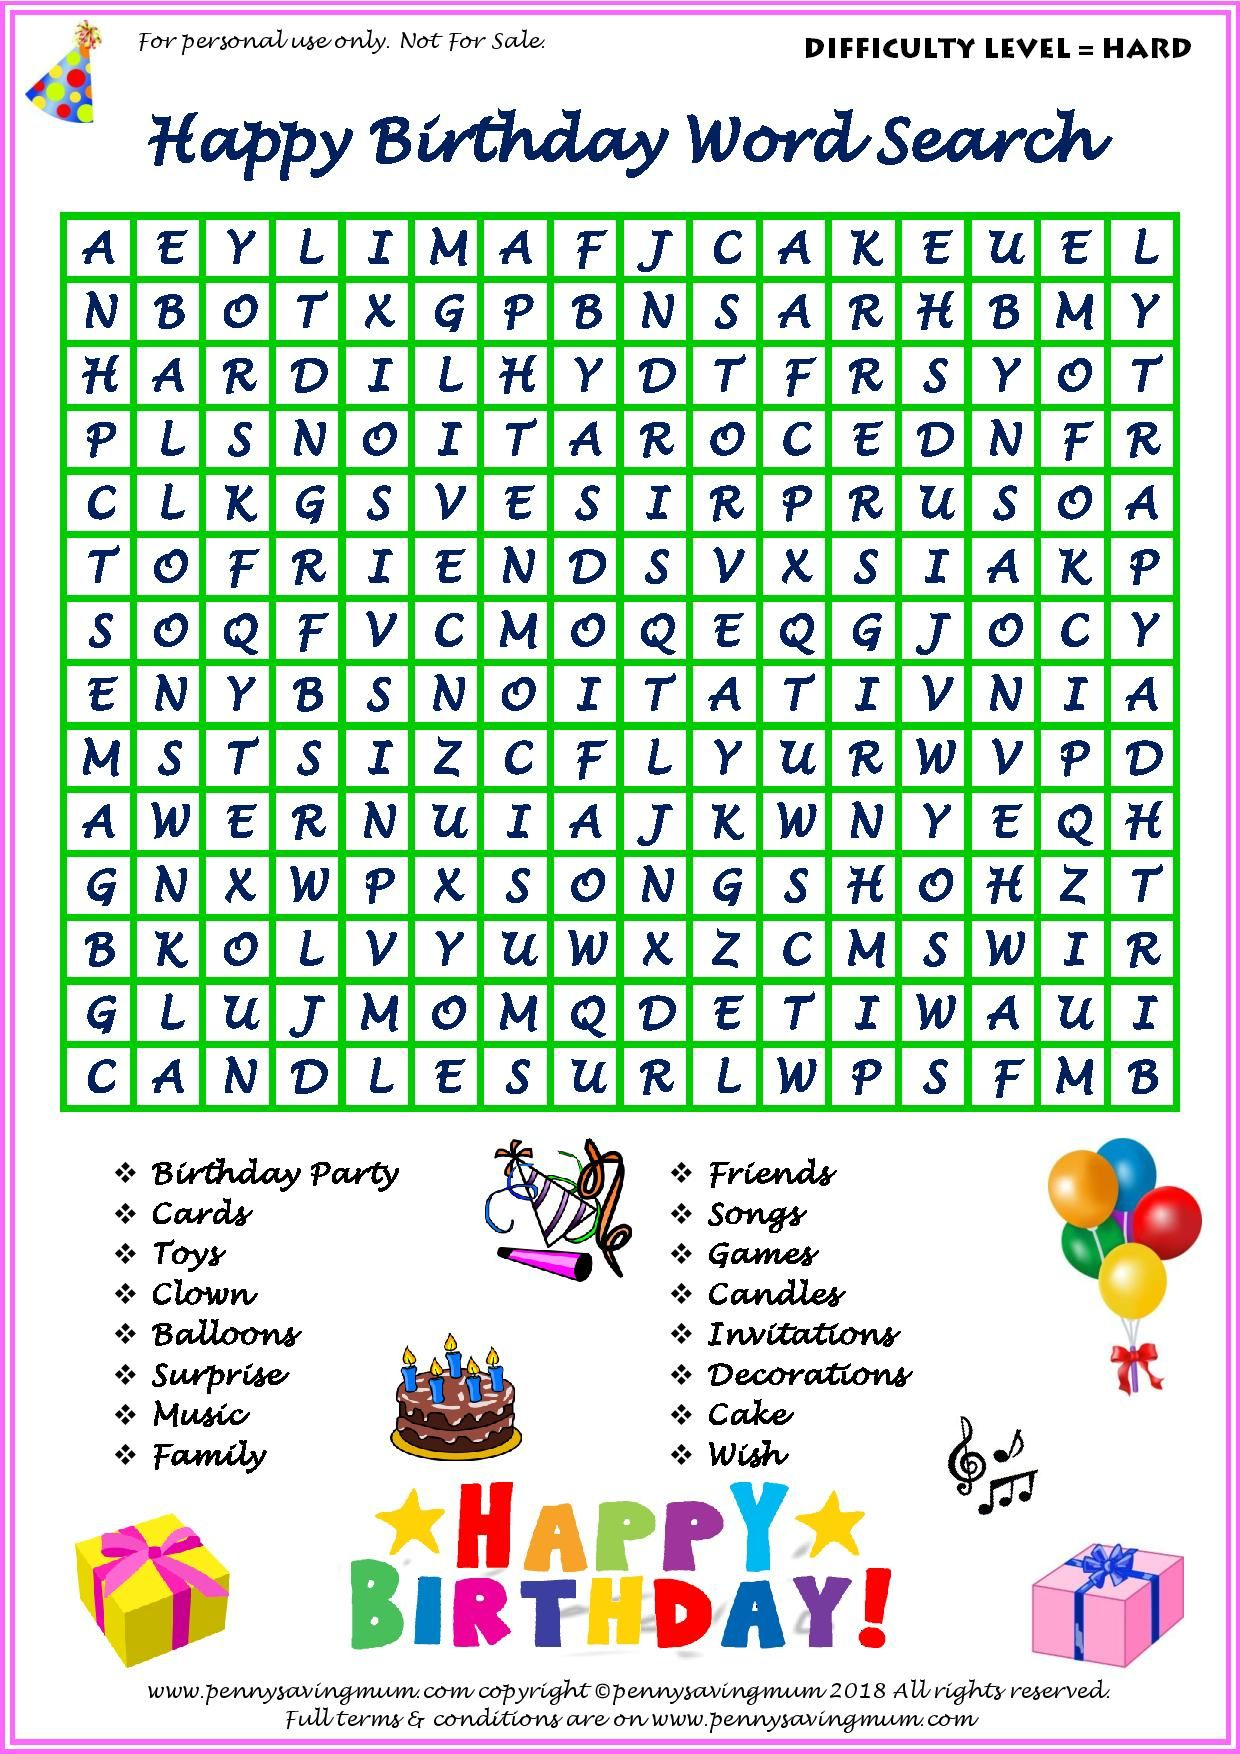 Word Search Happy Birthday (Hard Version) | Happy Birthday